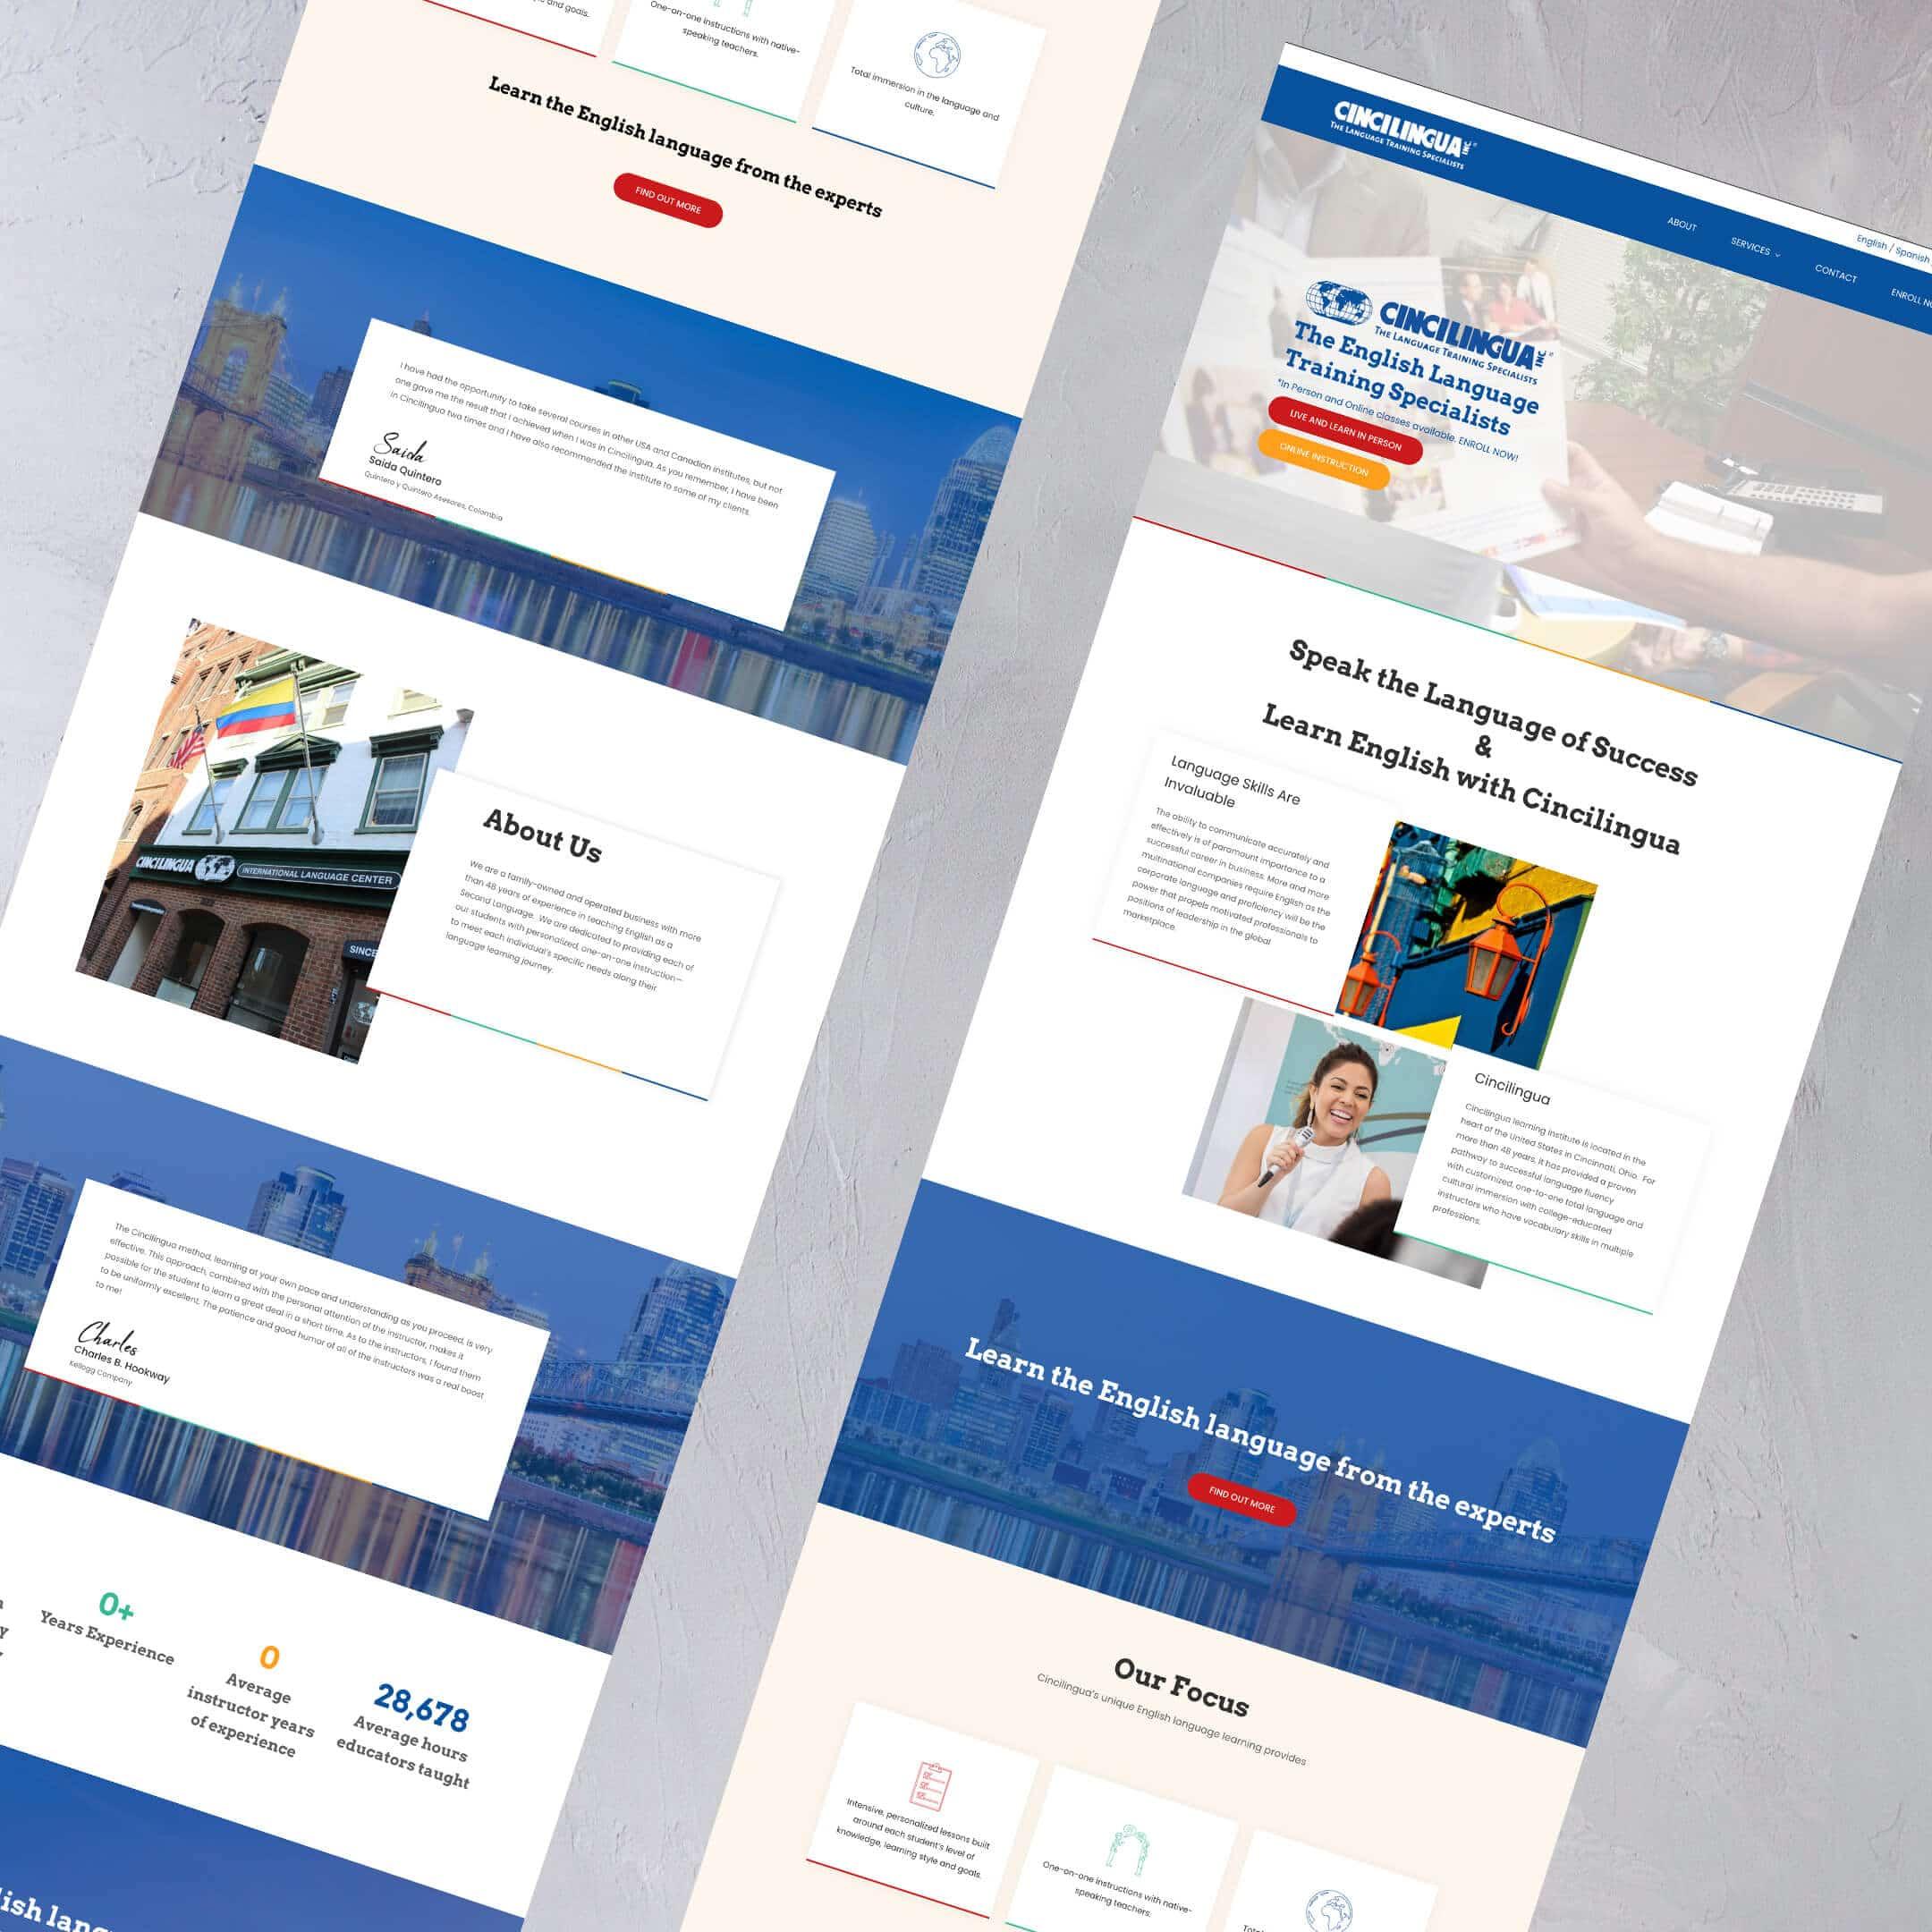 cincilingua services page - multilingual website - English Translation services in Cincinnati, Ohio